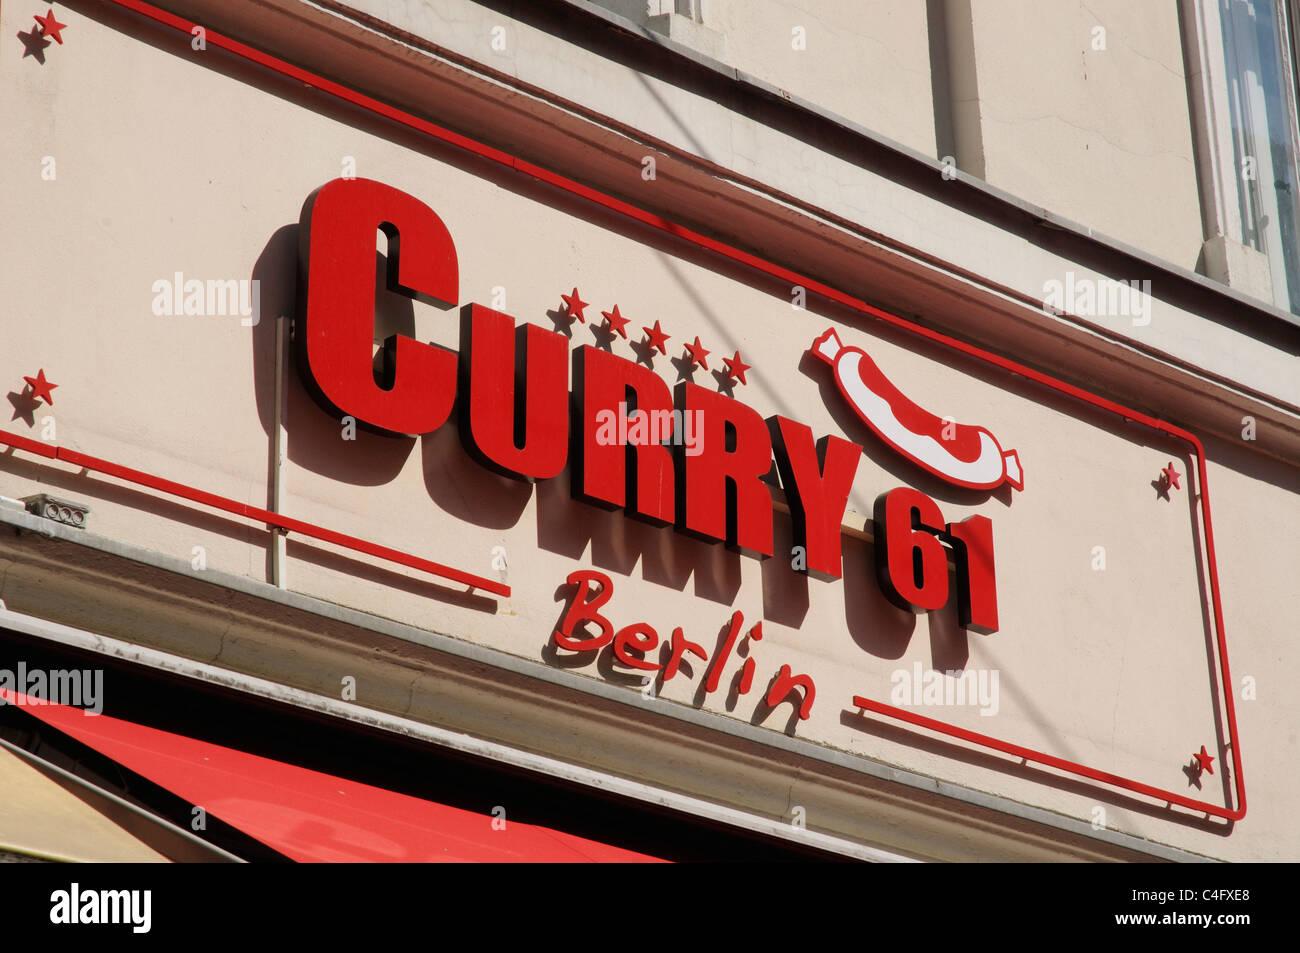 berlin fast food stockfotos berlin fast food bilder alamy. Black Bedroom Furniture Sets. Home Design Ideas